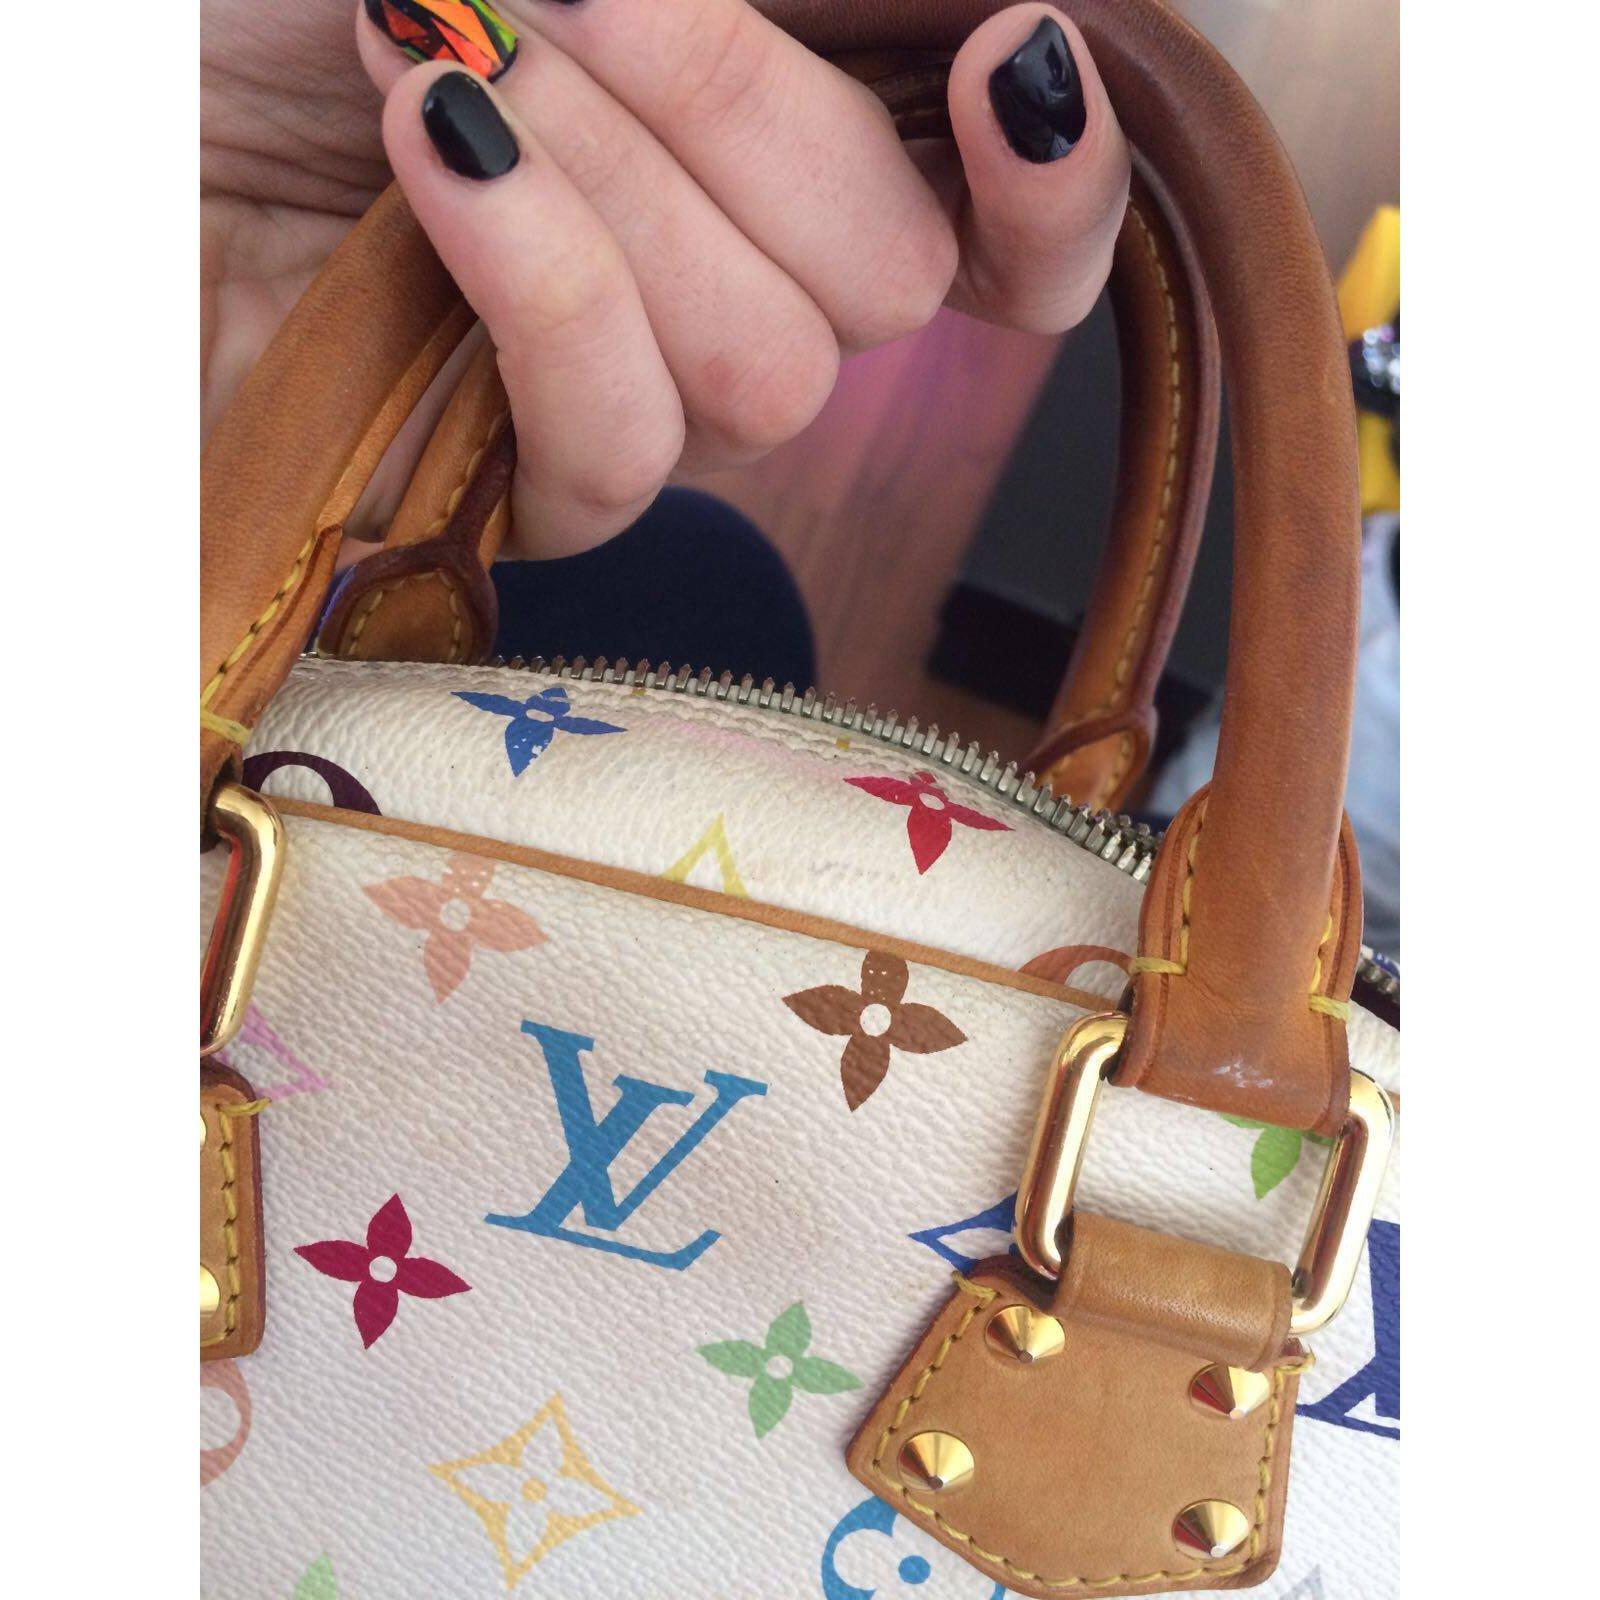 04caa4a882f38 Facebook · Pin This. Sacs à main Louis Vuitton Monogram Multicolore  Trouville Cuir Blanc ...